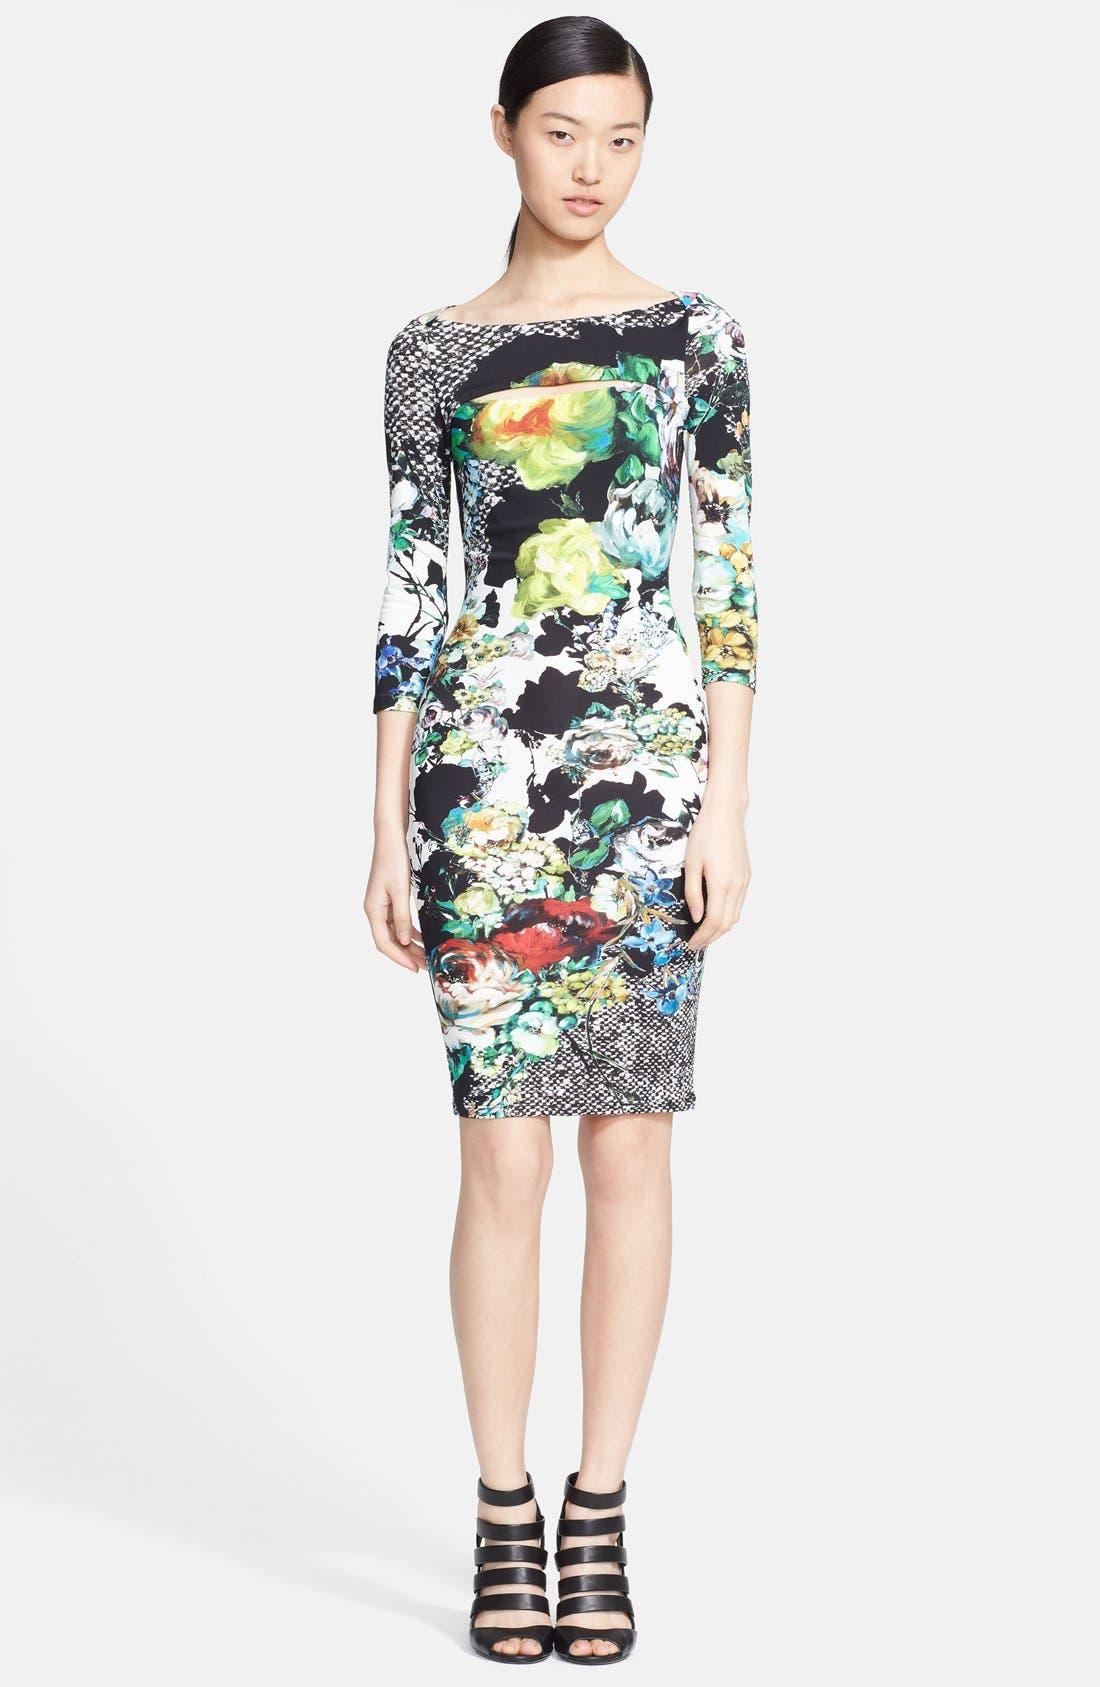 Alternate Image 1 Selected - Roberto Cavalli Slit Neck Print Dress